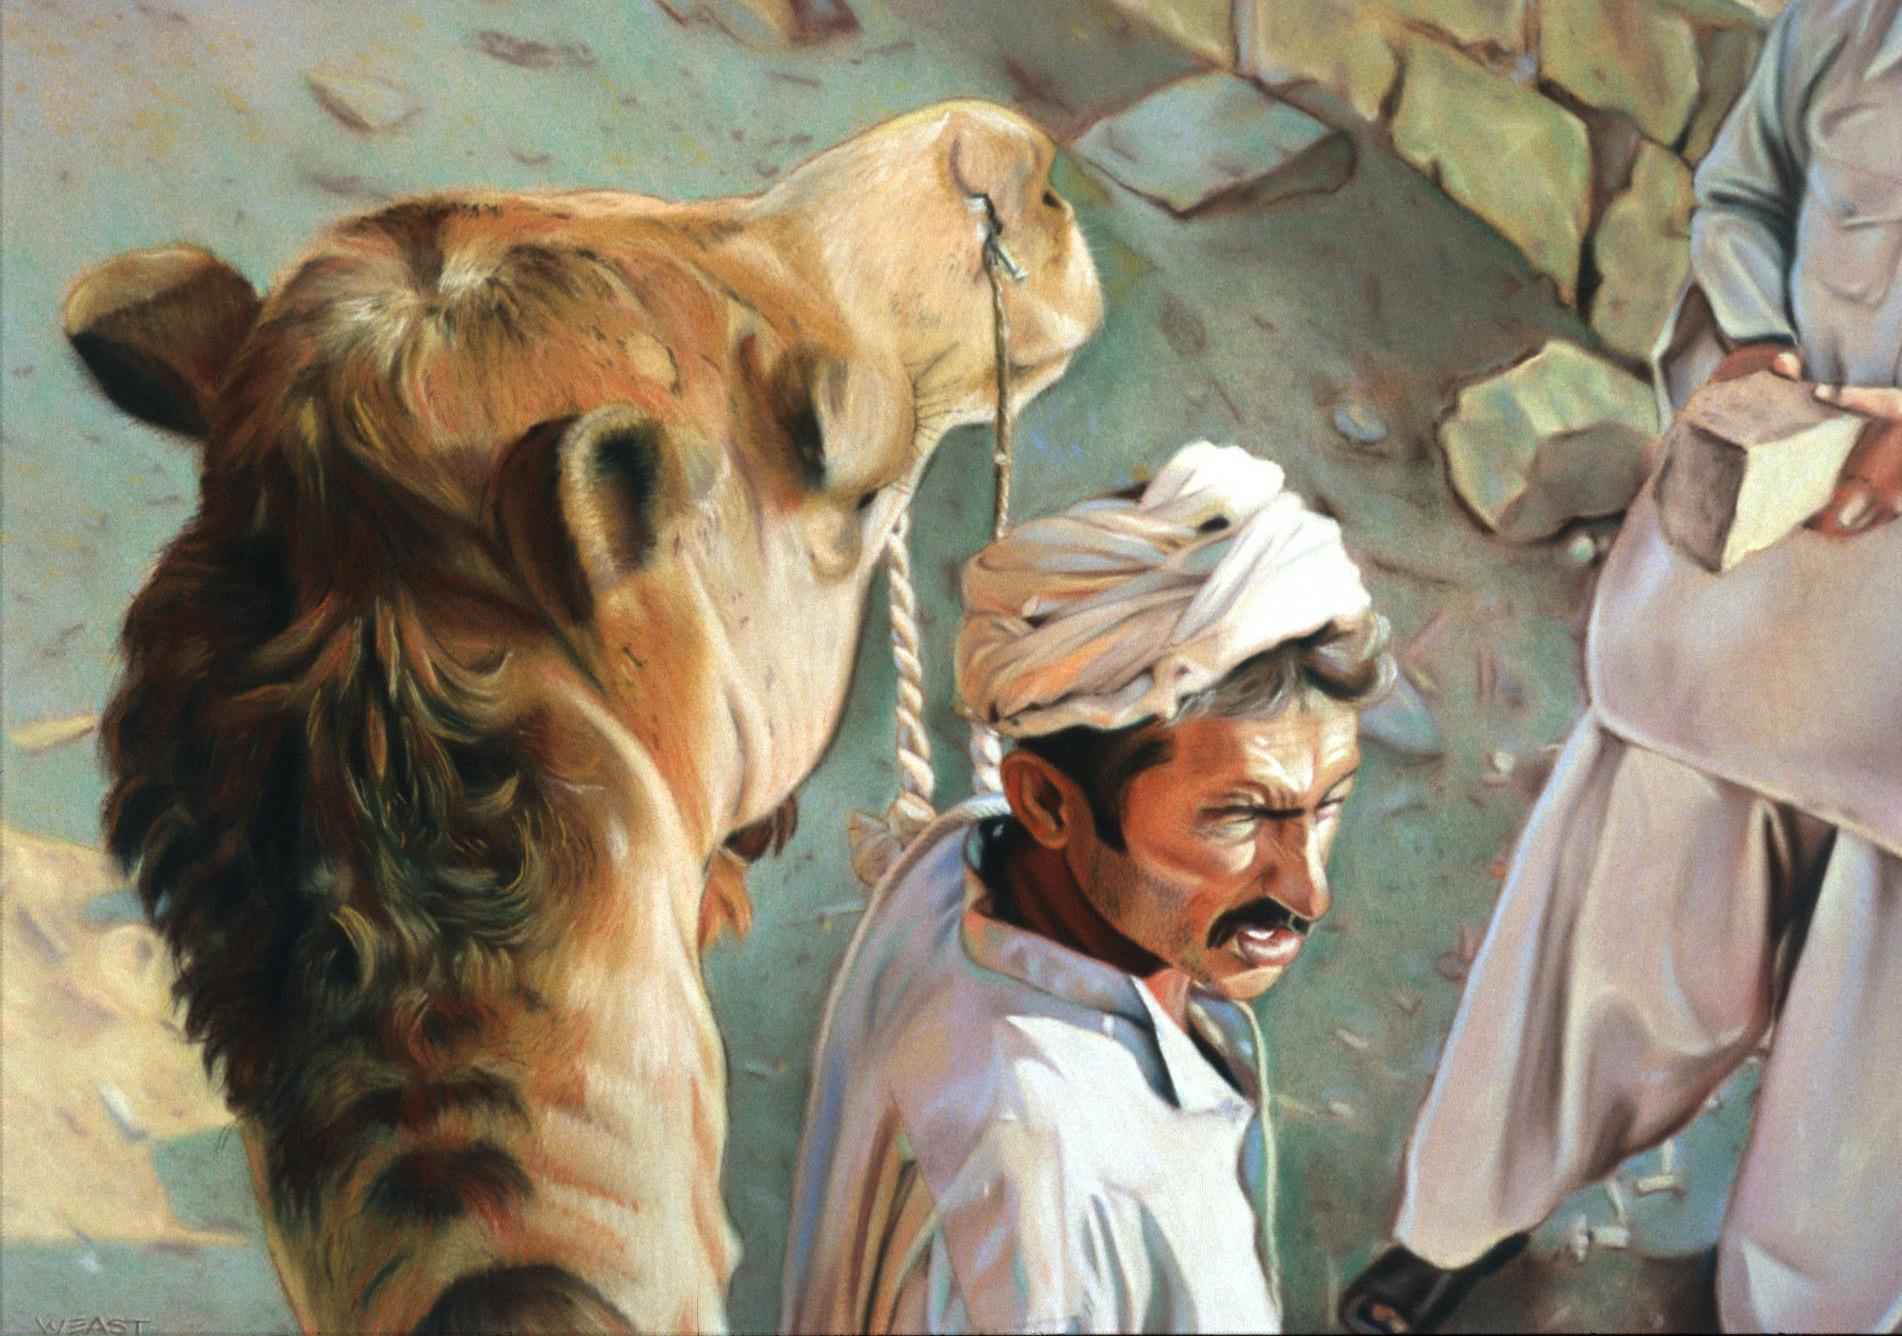 karachi camel driver